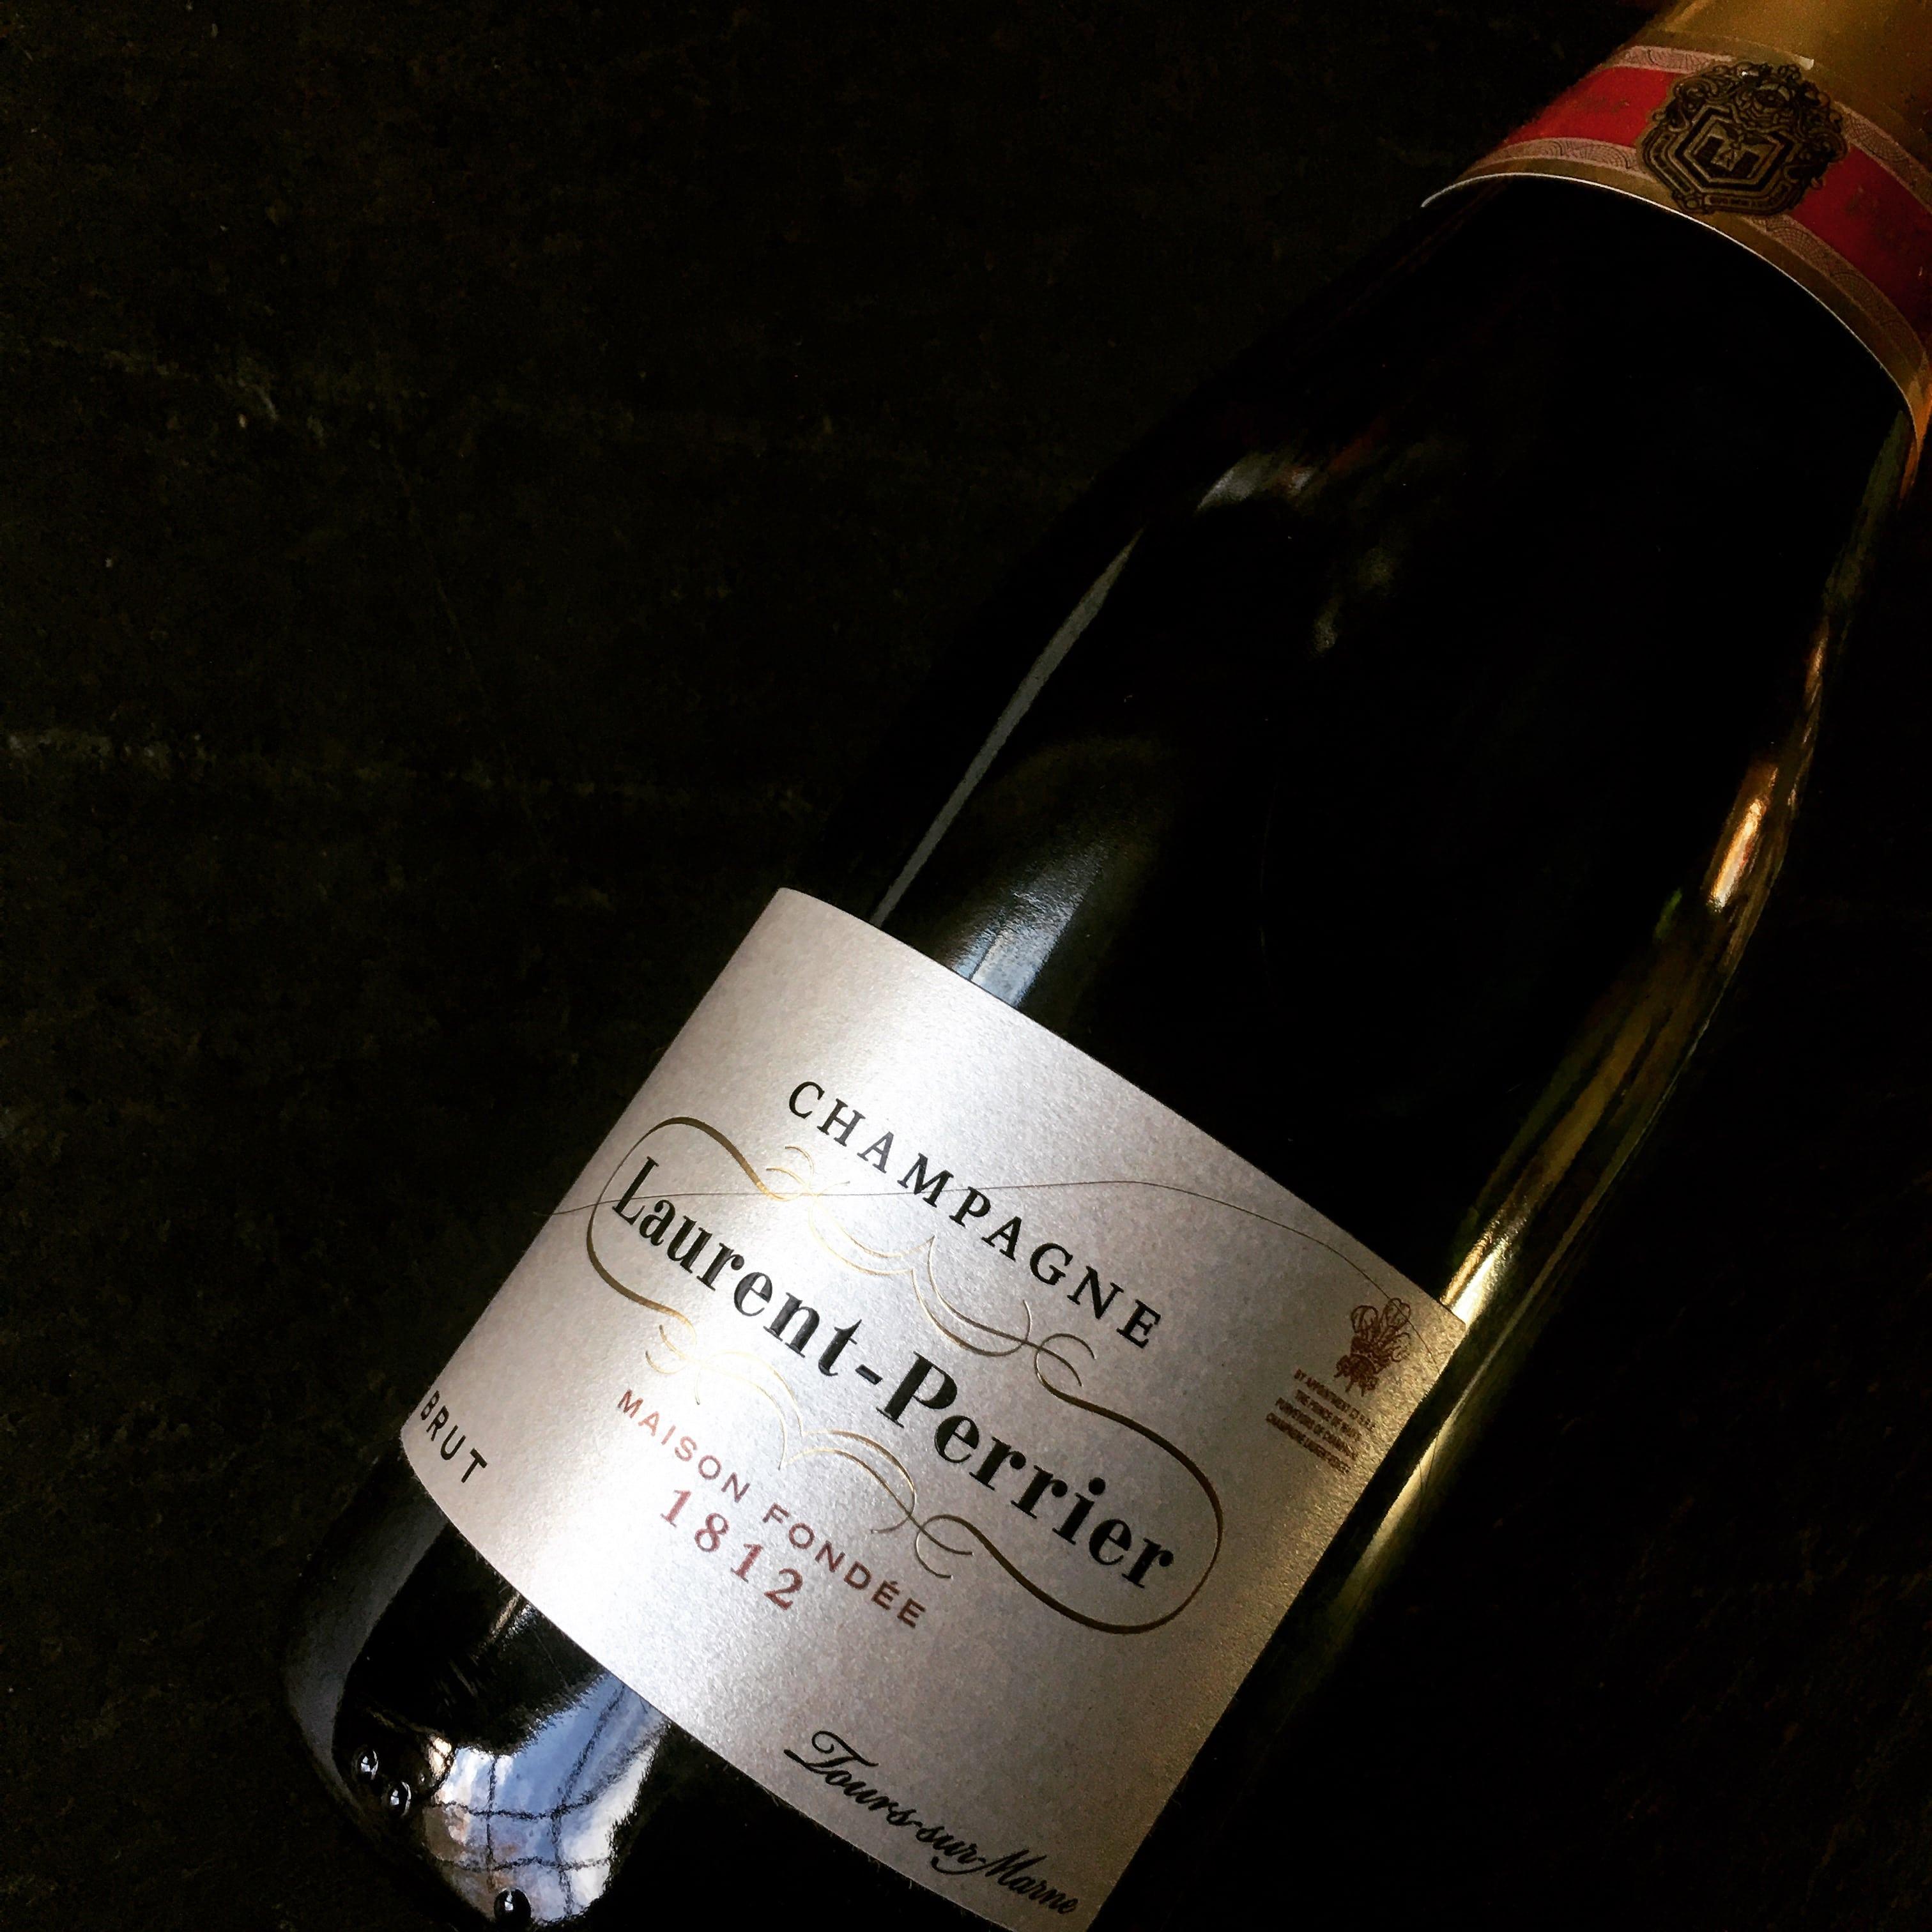 Laurent-Perrier Champagne Brut